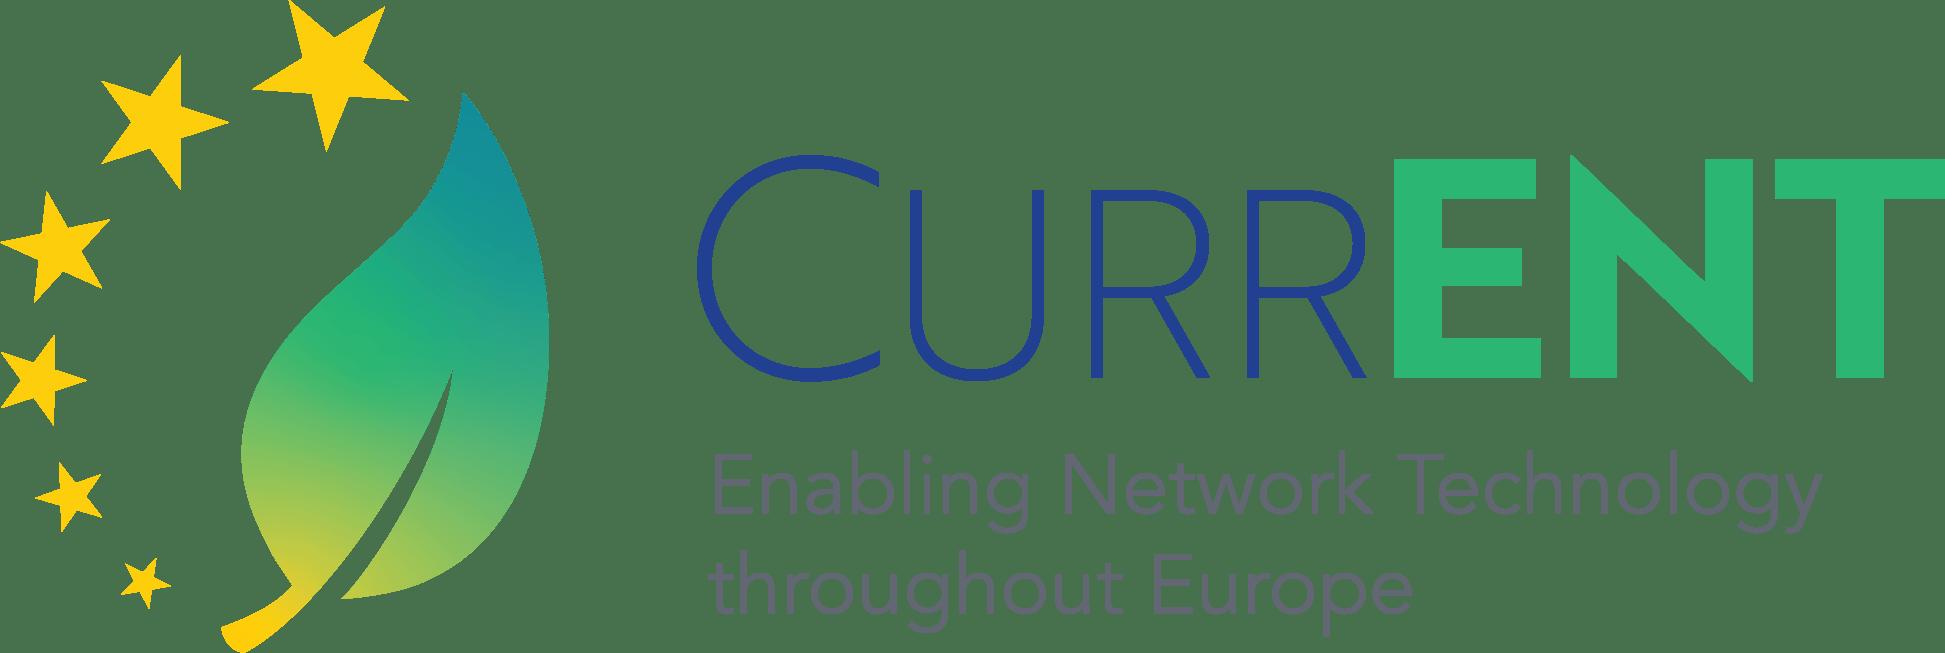 currENT-Logo-4color@4x-8